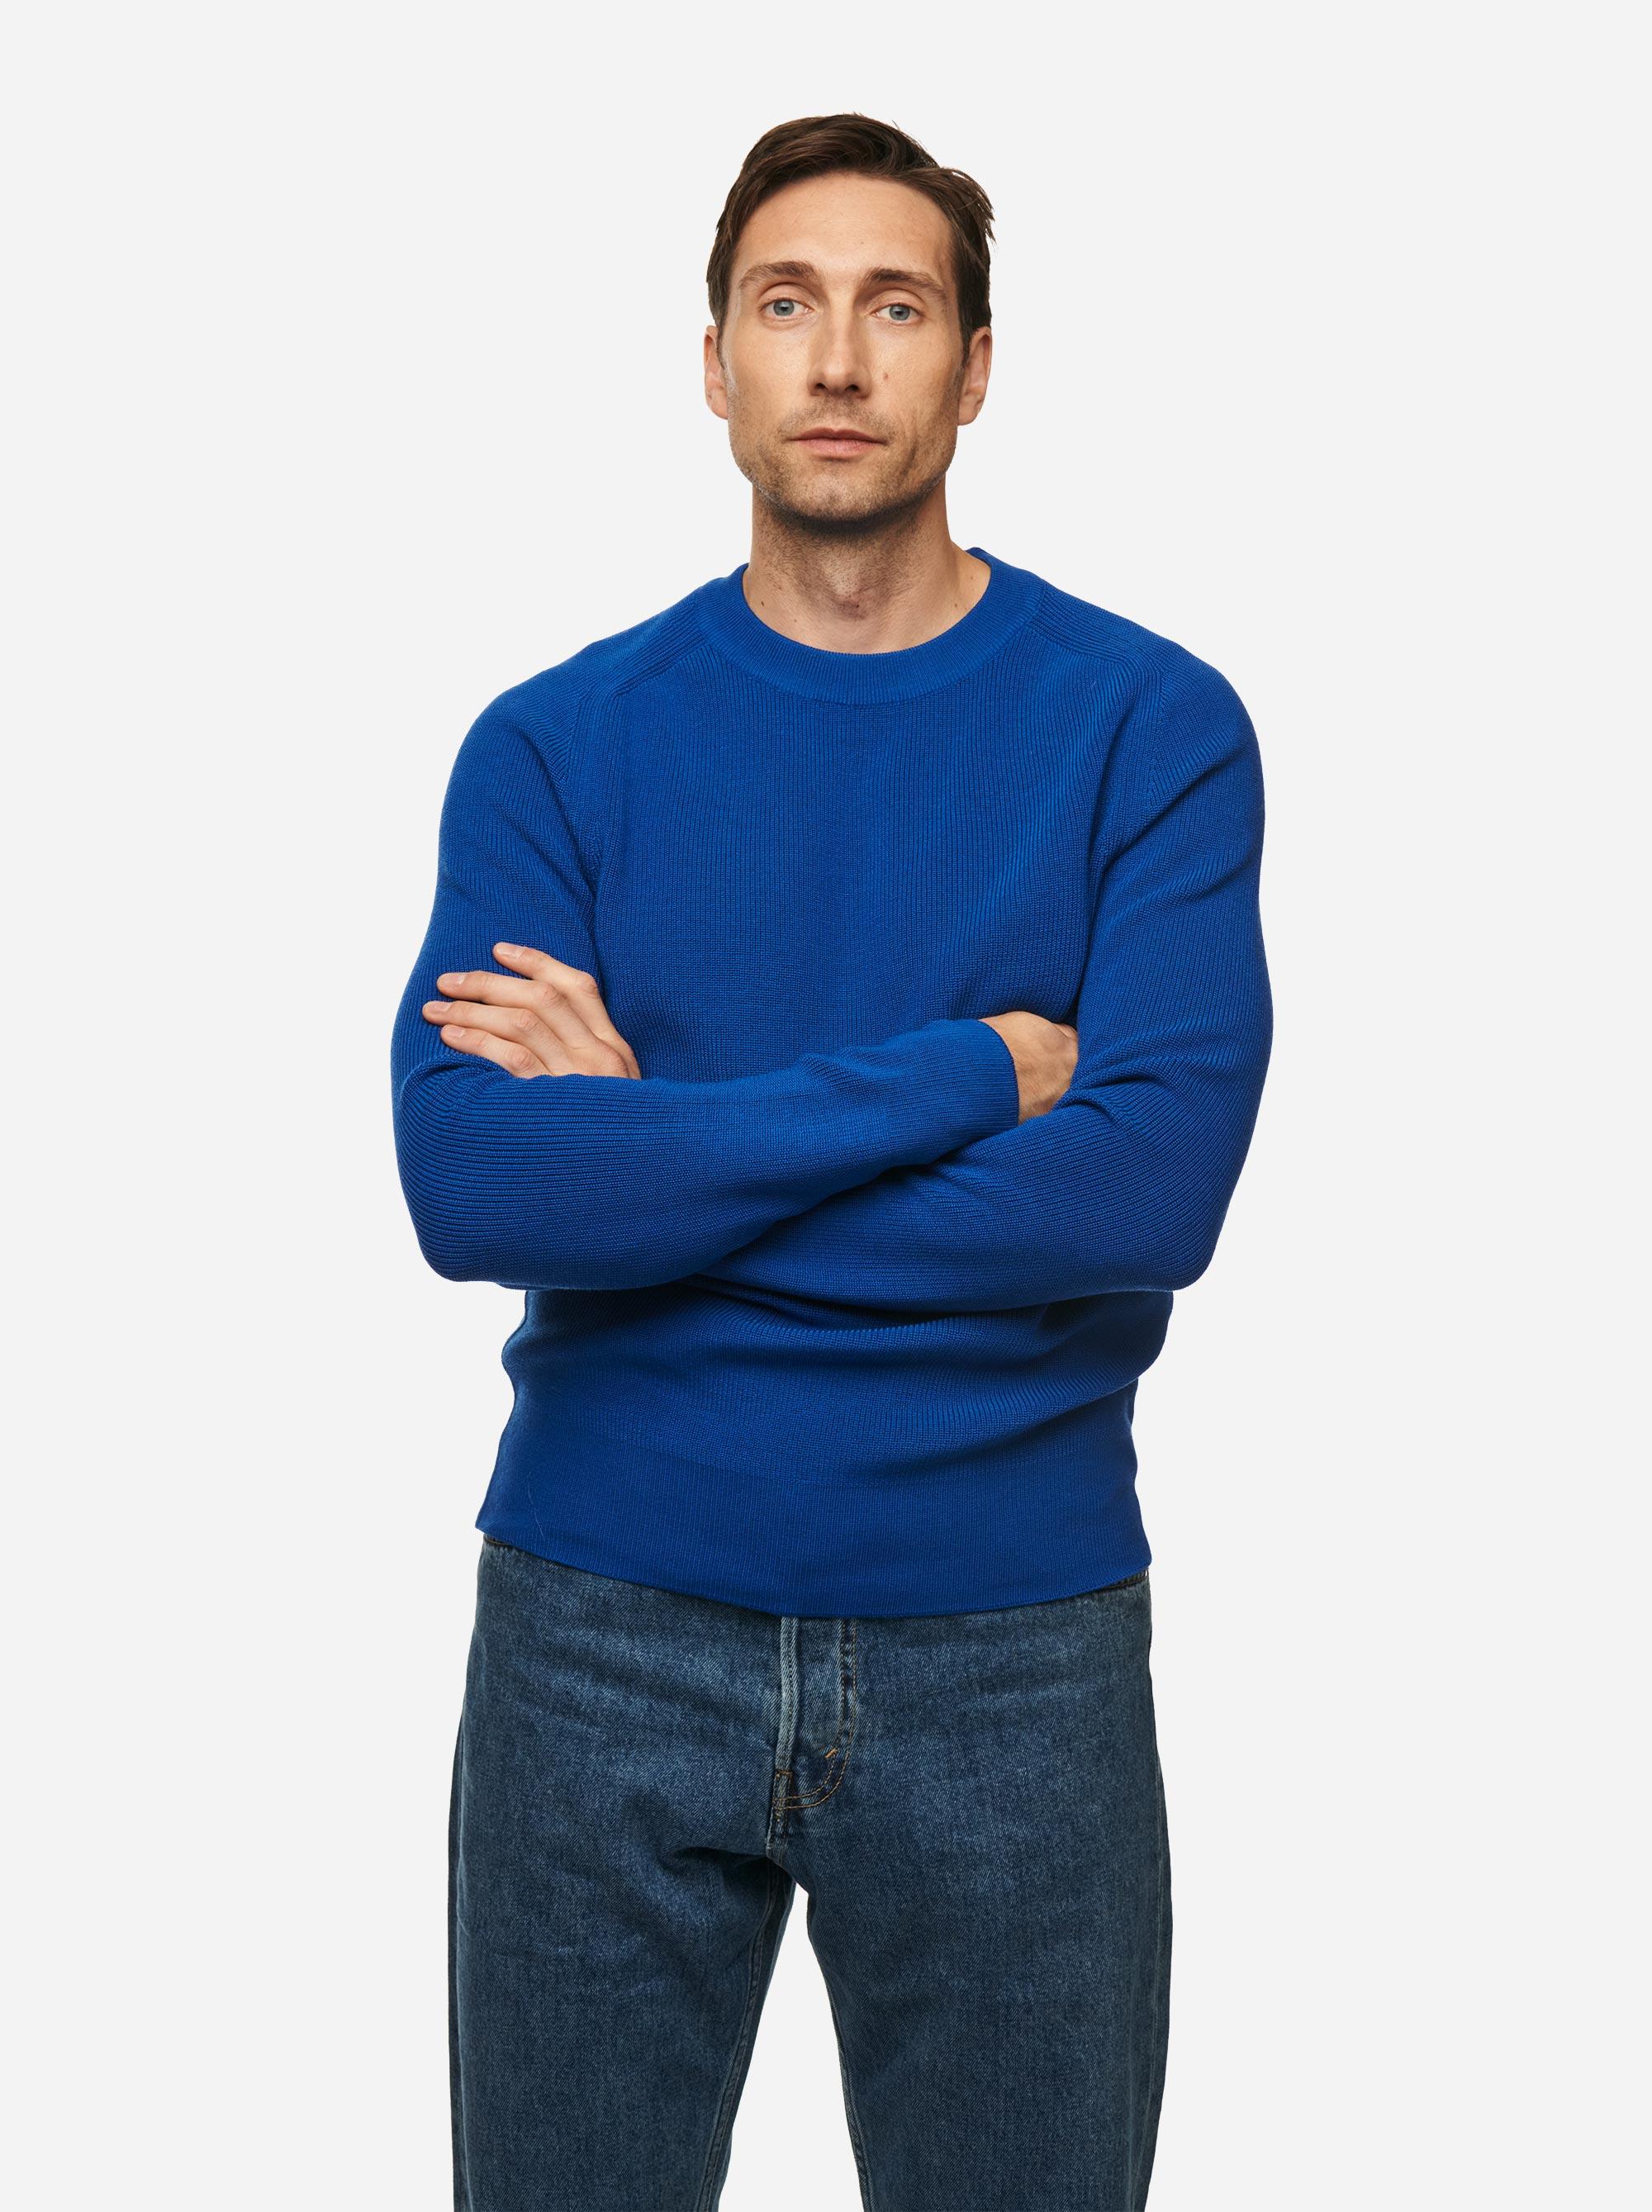 Teym - Crewneck - The Merino Sweater - Men - Cobalt blue - 1